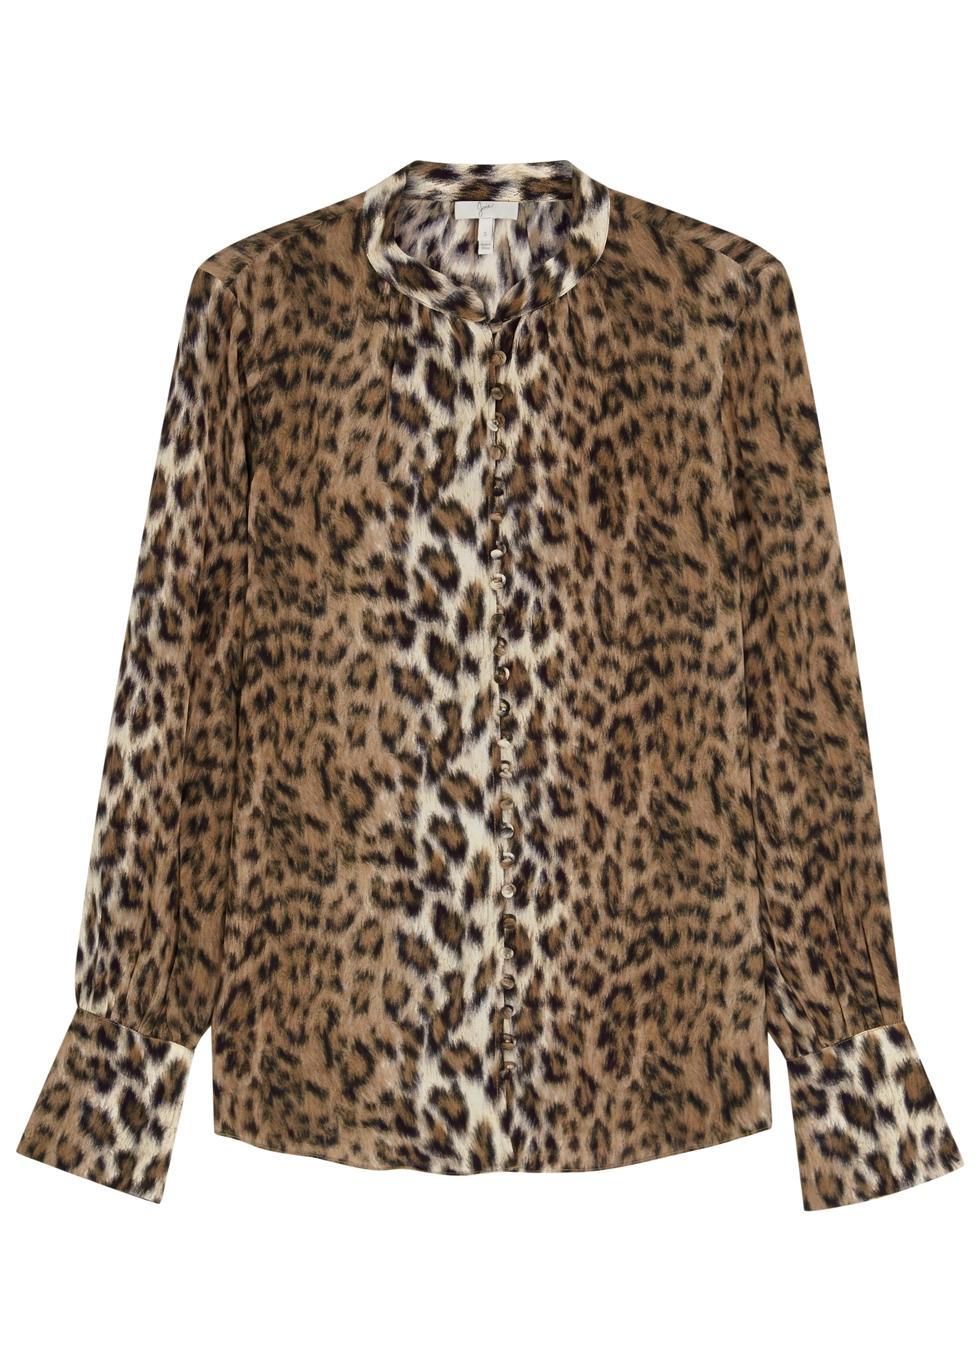 vintage style clothes rail uk, women's designer clothing, dresses and luxury fashion - harvey nichols, Design ideen